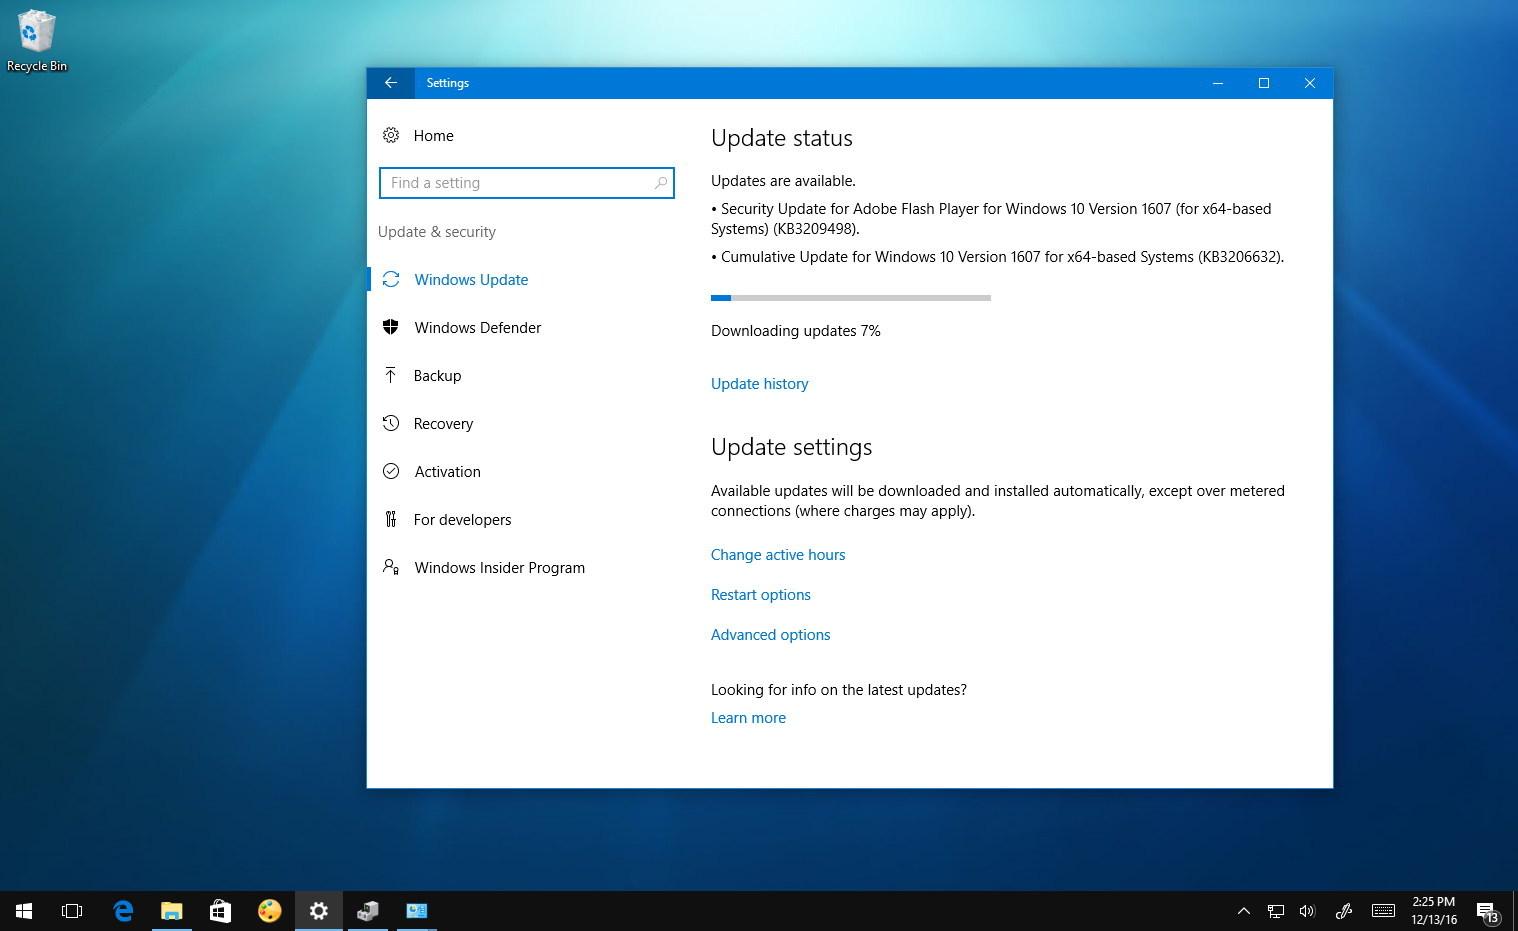 Windows 10 update KB3206632